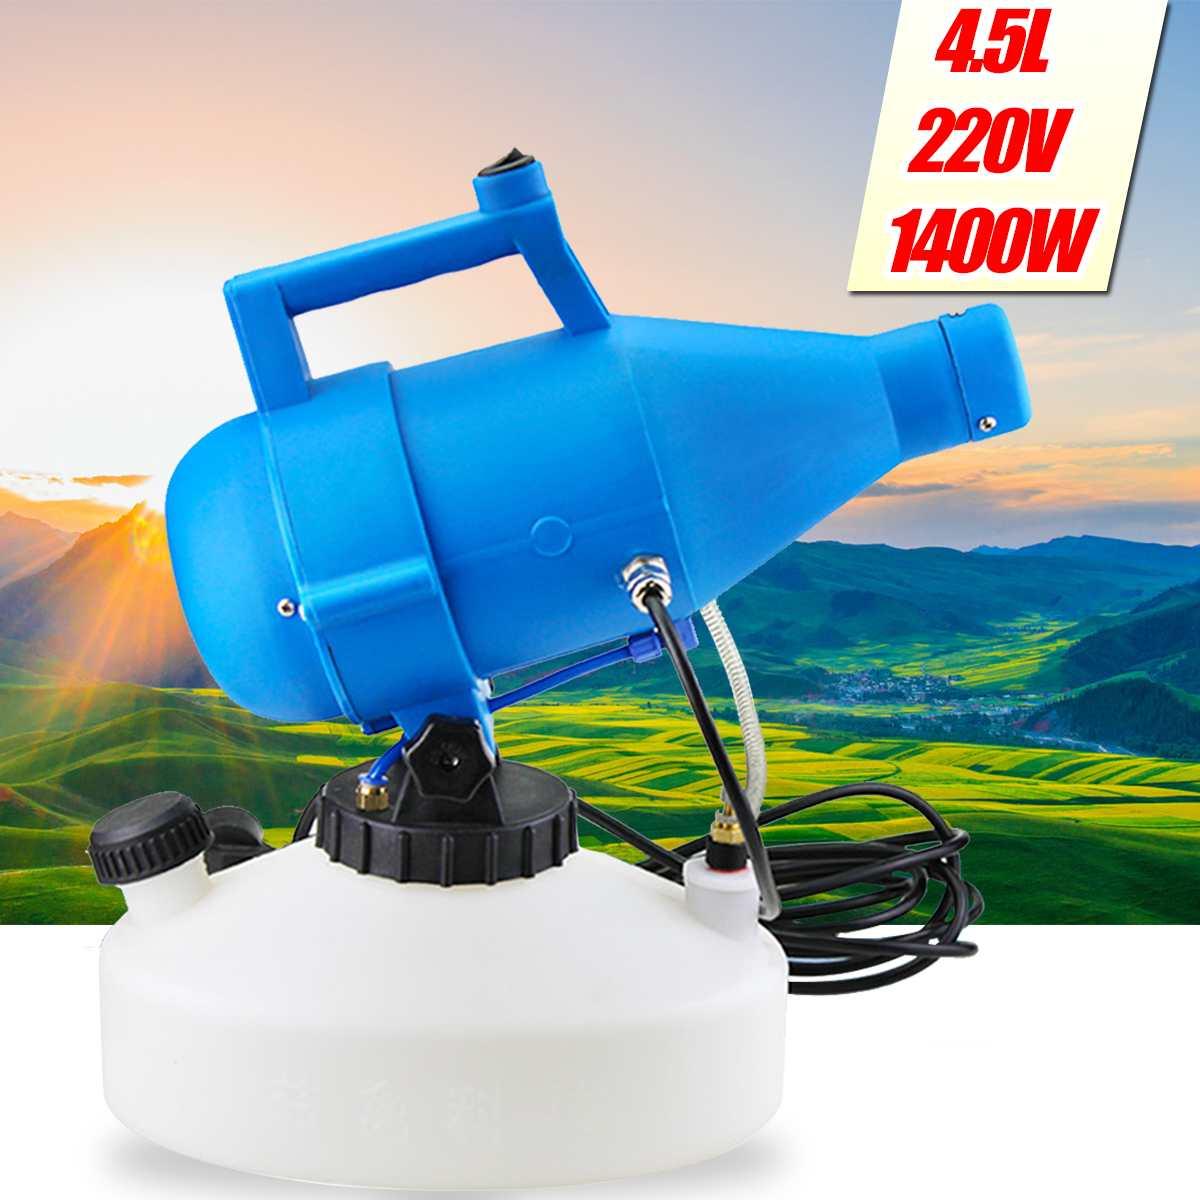 220V 4.5L 1400W Draagbare Elektrische Ulv Fogger Machine Spuit Hotels Desinfectie Thuis Sterilizat Residence Kantoor Industrie